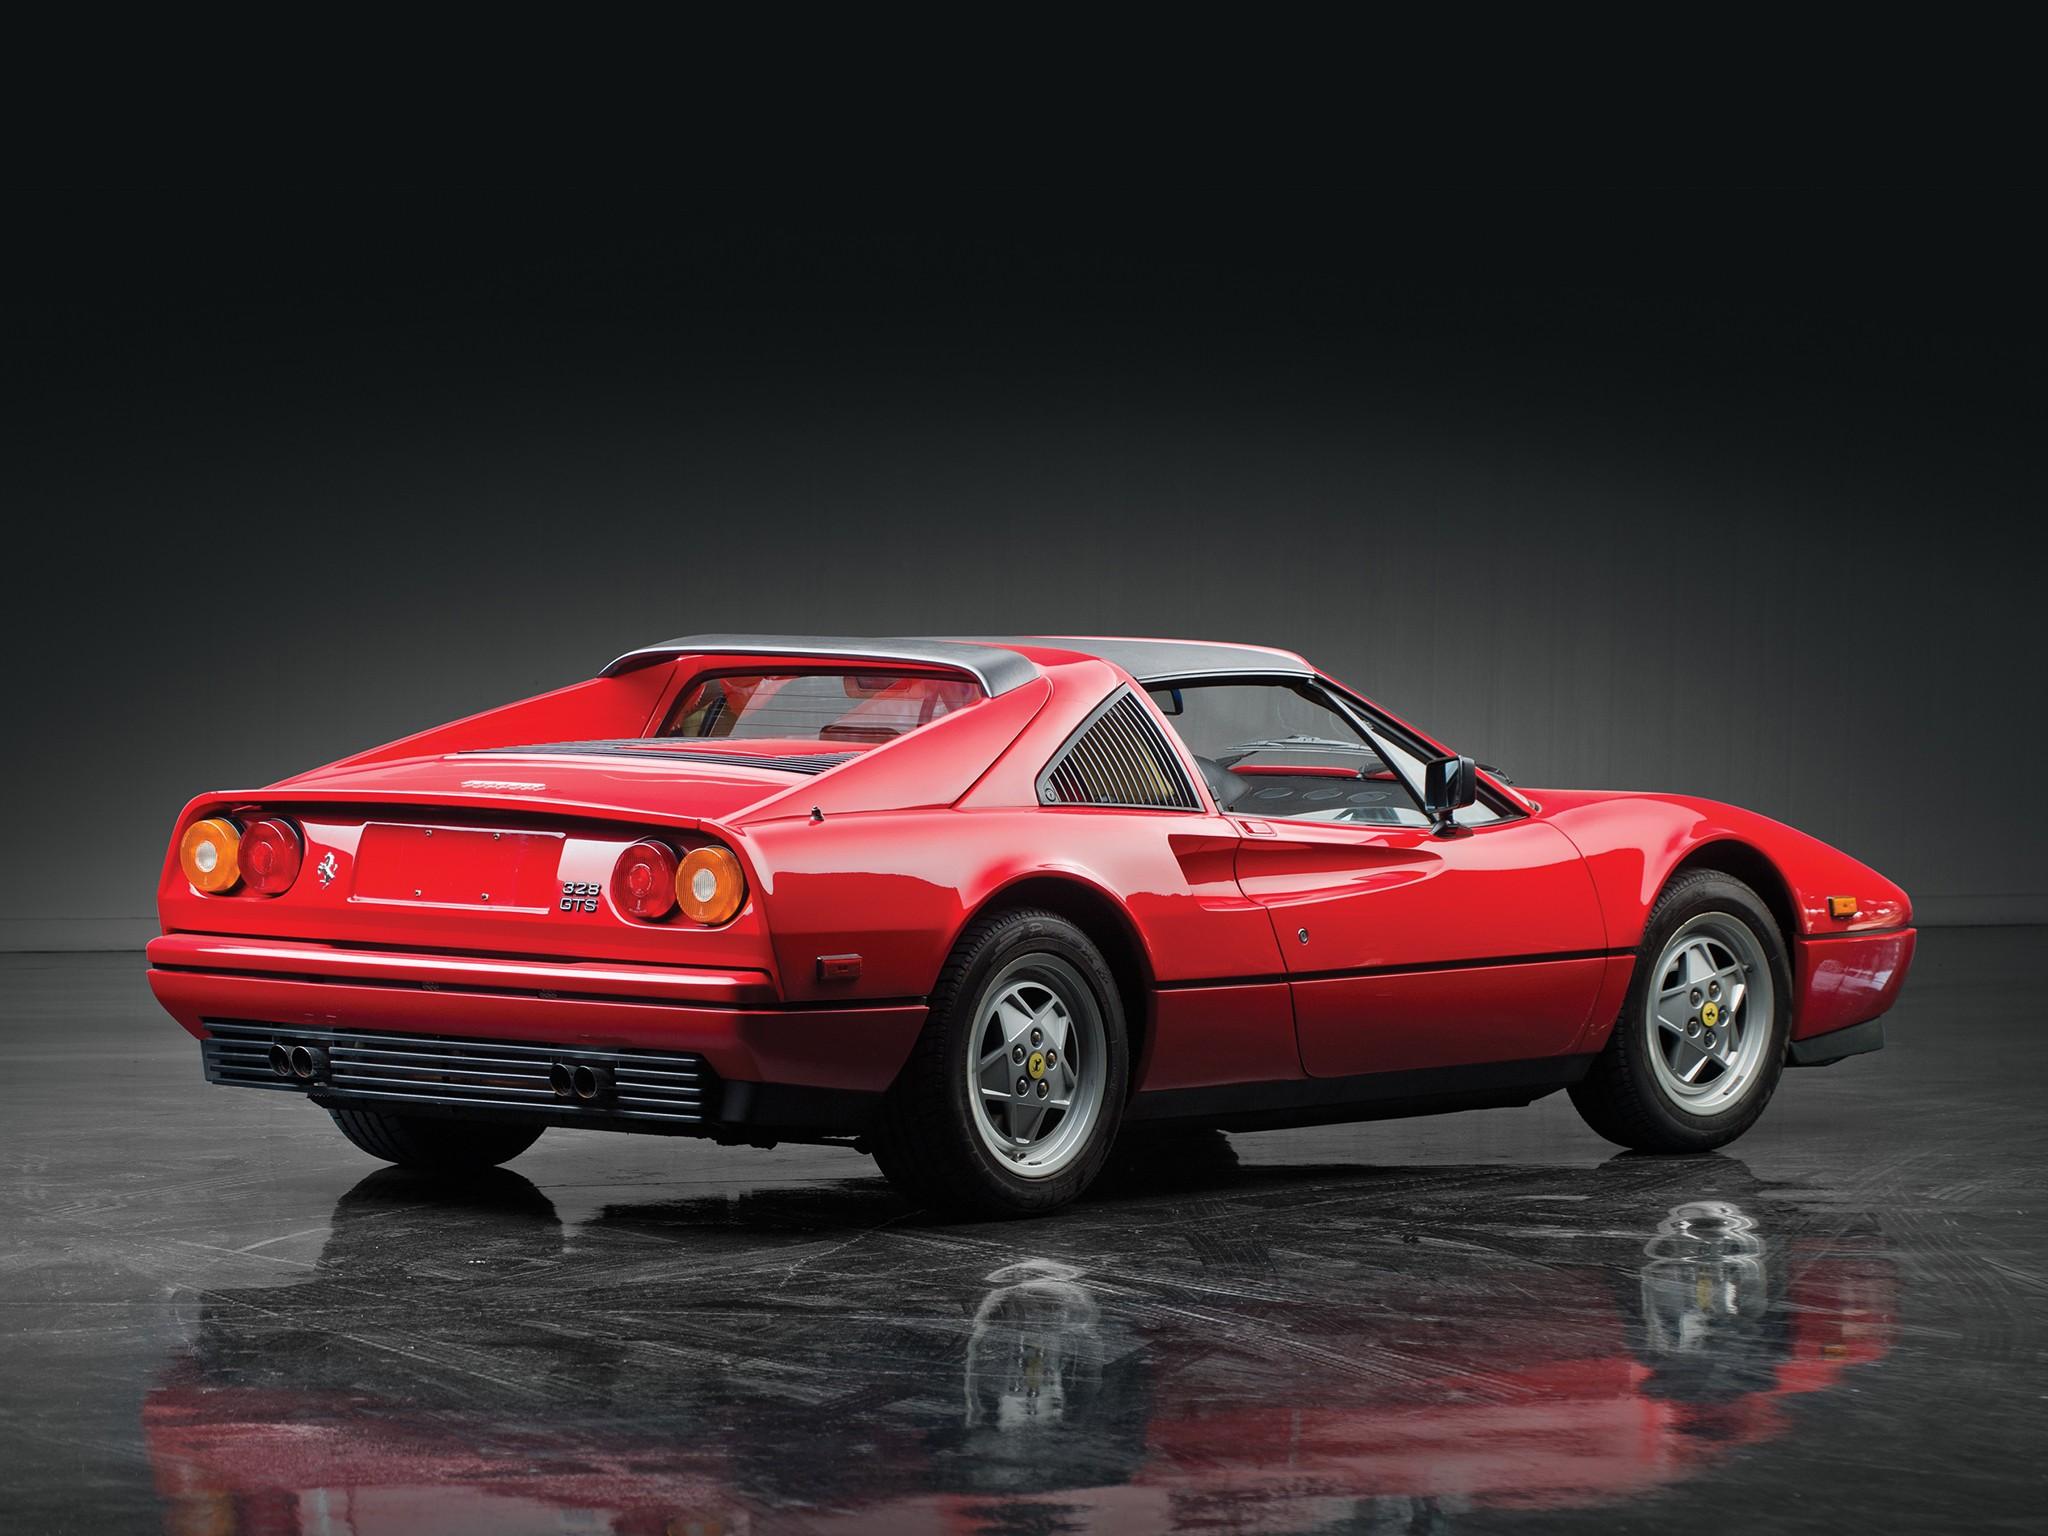 Ferrari 328 gts specs 1985 1986 1987 1988 1989 autoevolution ferrari 328 gts 1985 1989 vanachro Image collections